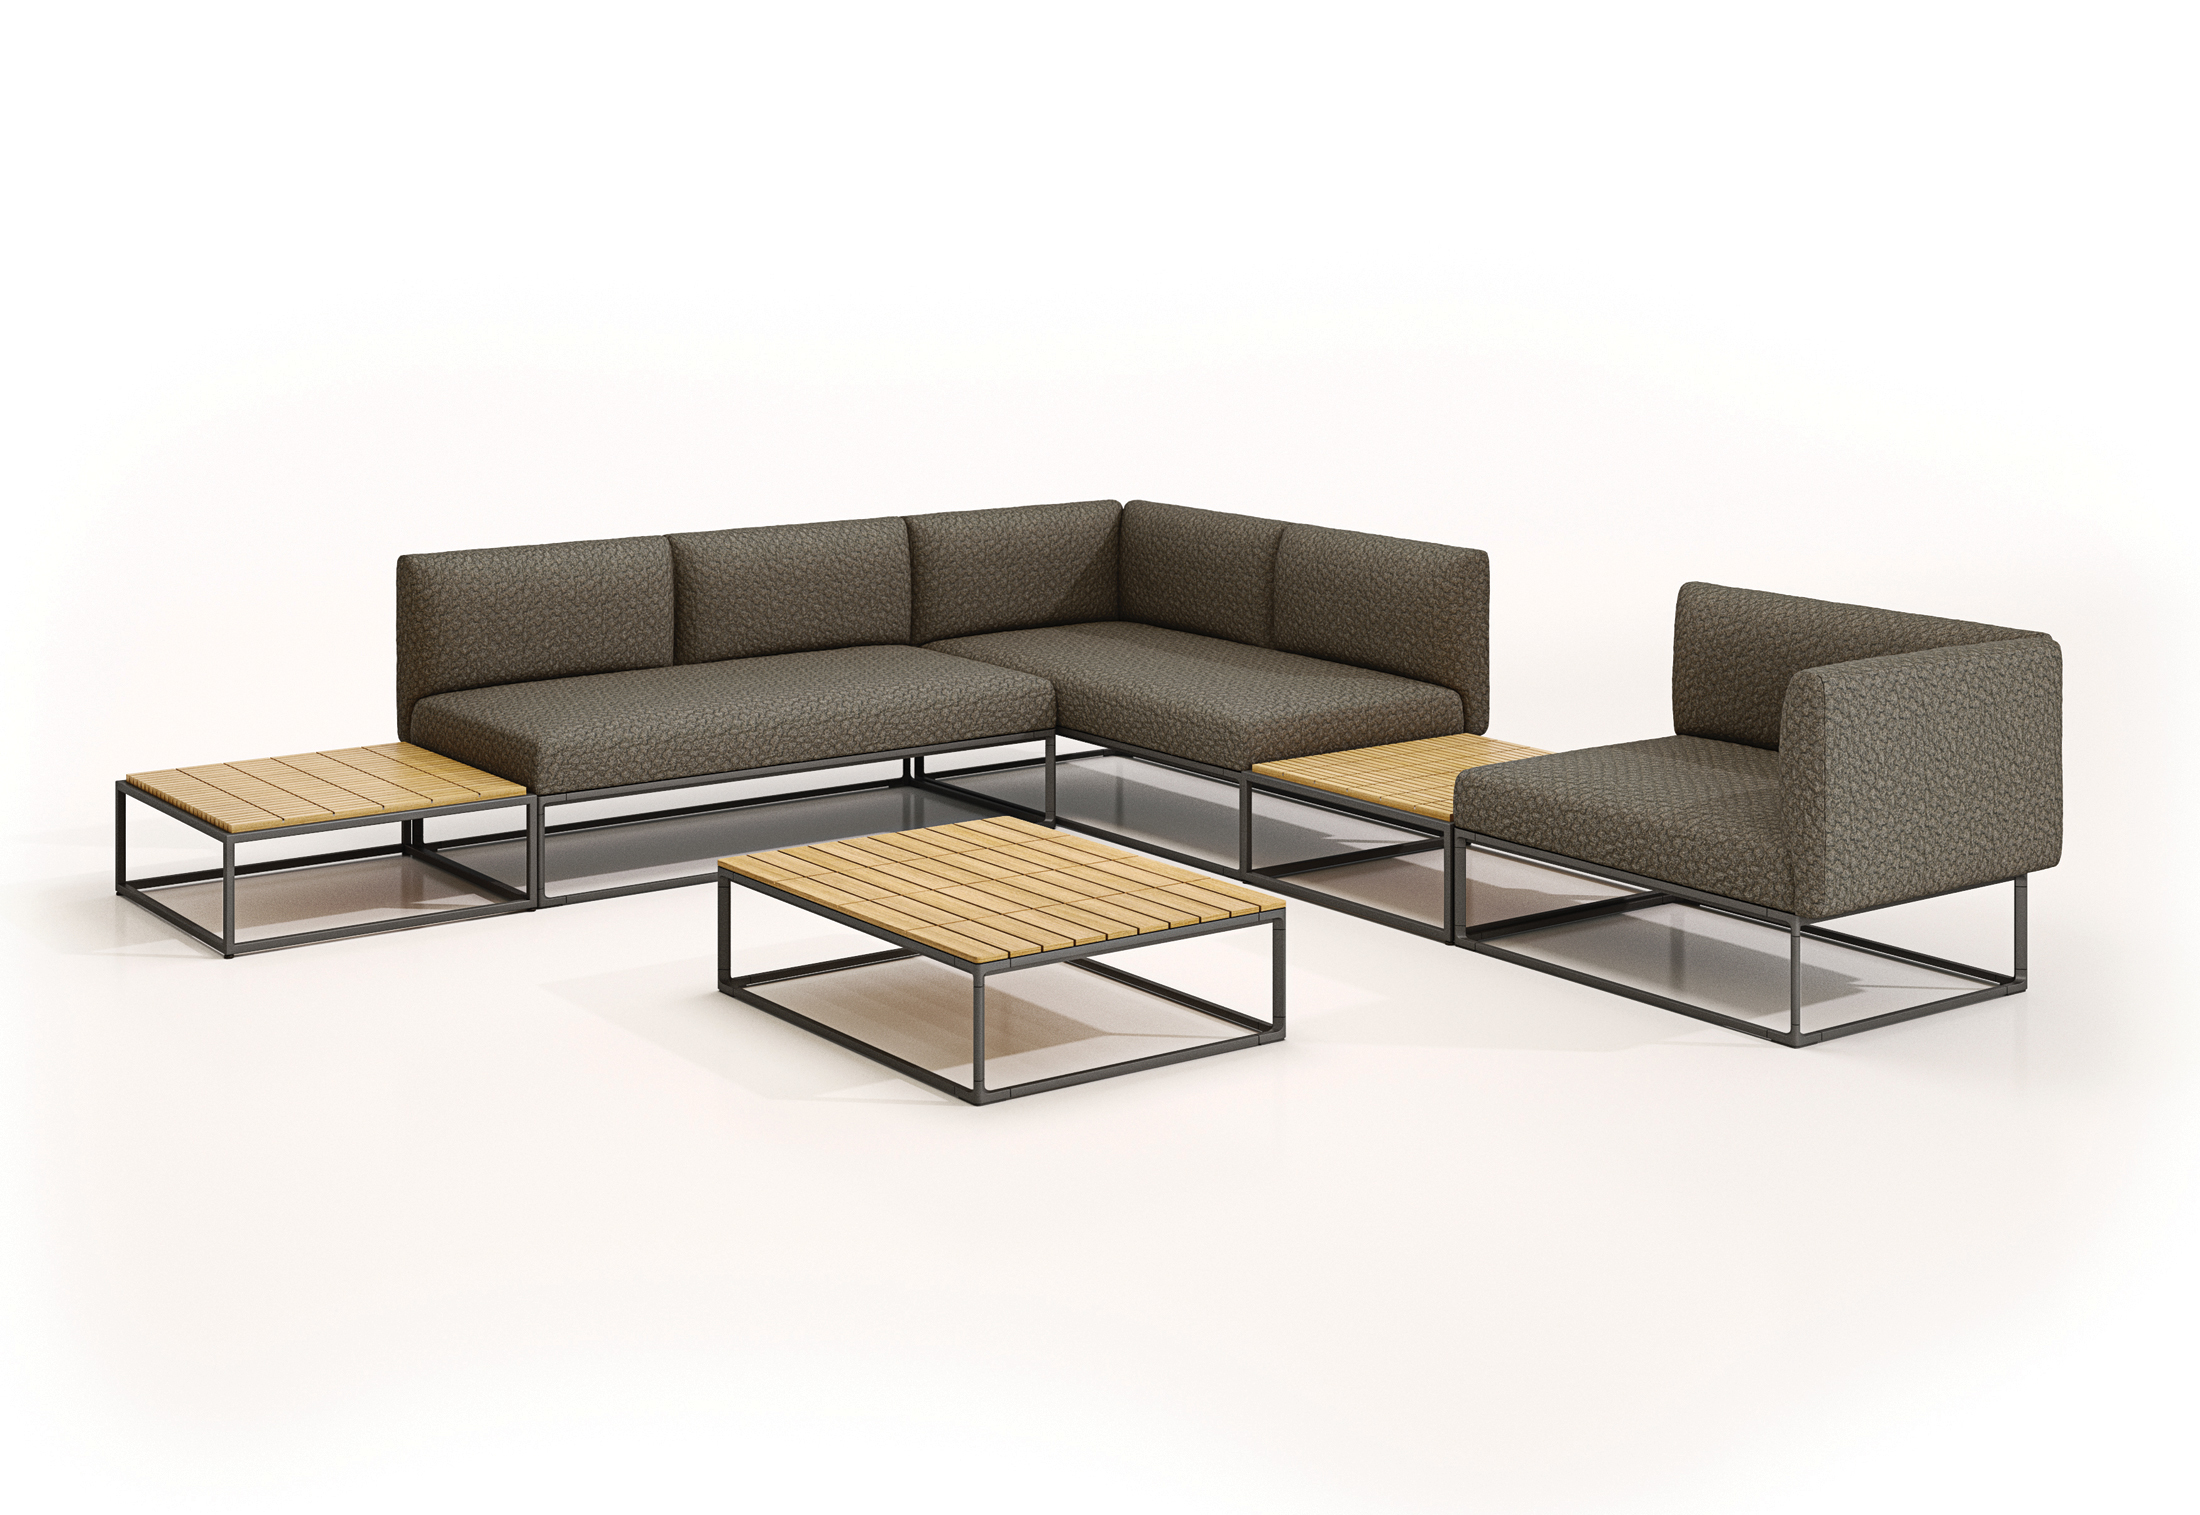 Maya Coffee Table.Maya Coffee Table By Gloster Furniture Stylepark